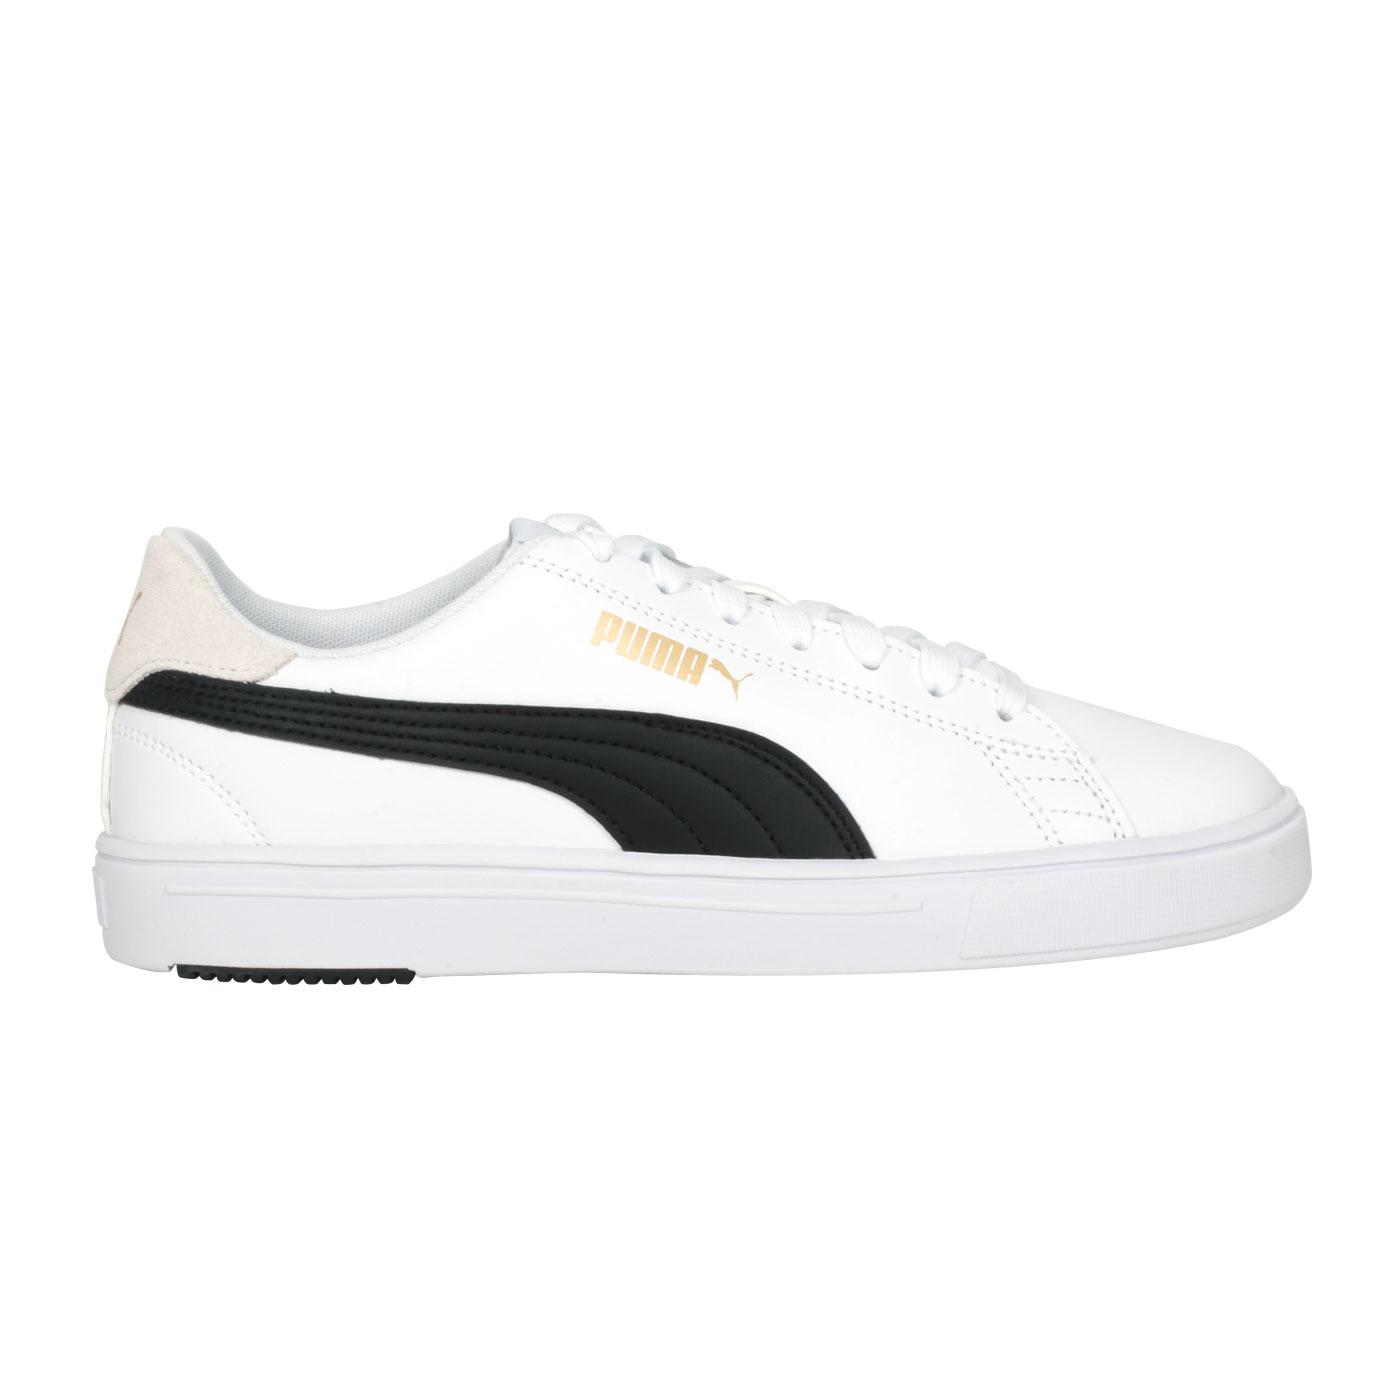 PUMA 男女休閒鞋  @Puma Serve Pro Lite@37490208